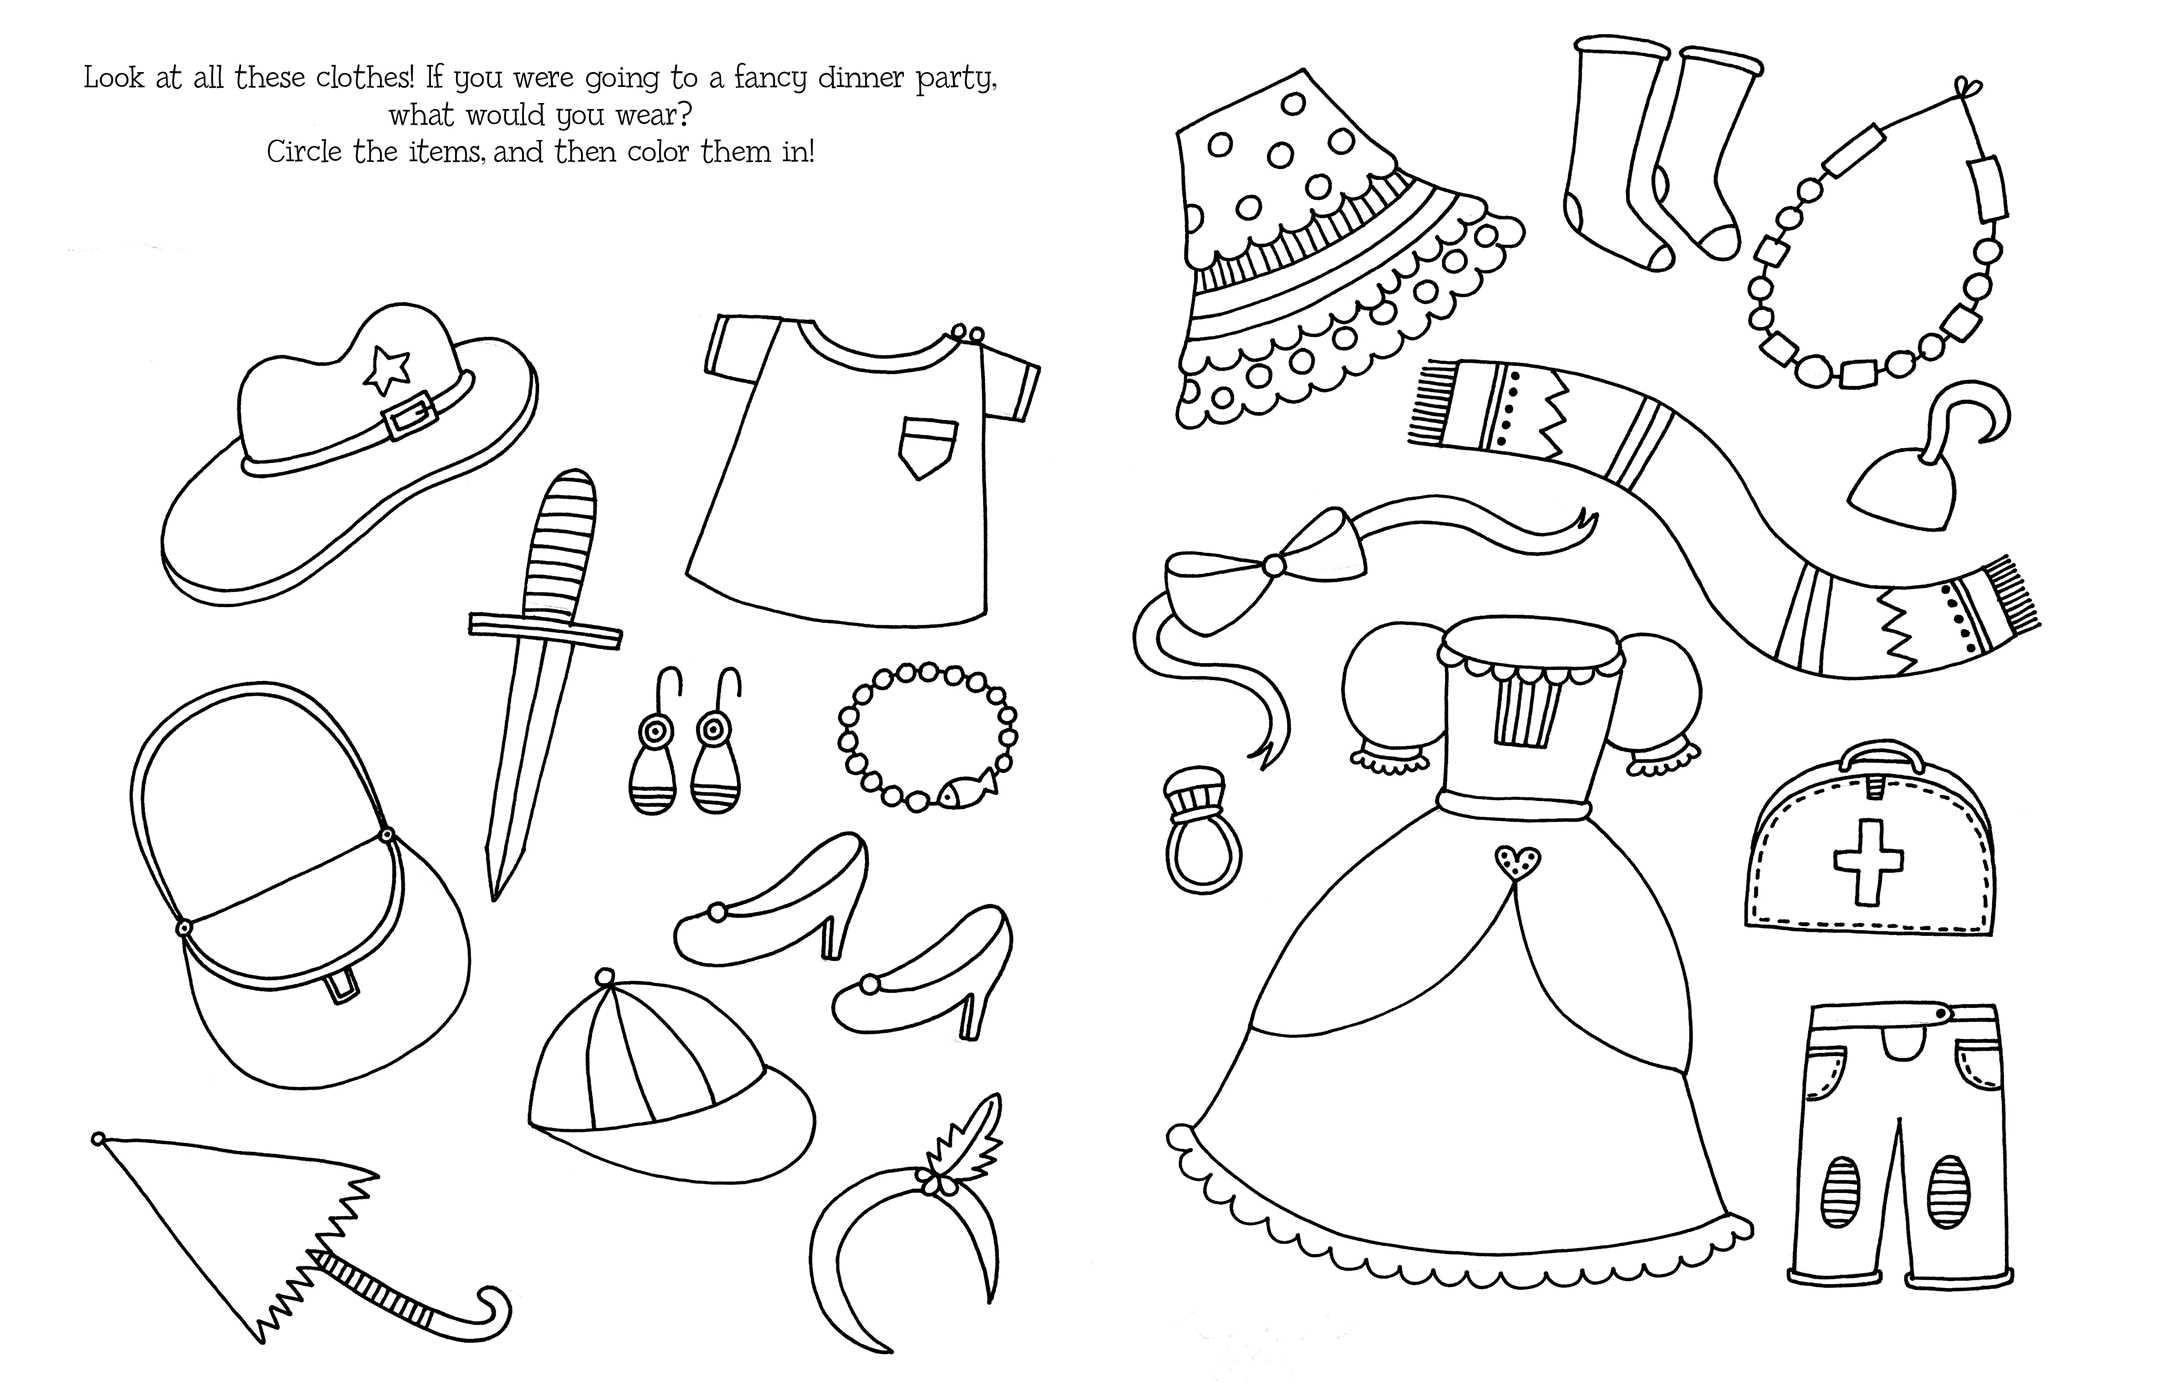 Dream doodle draw make believe magic 9781481462914.in06